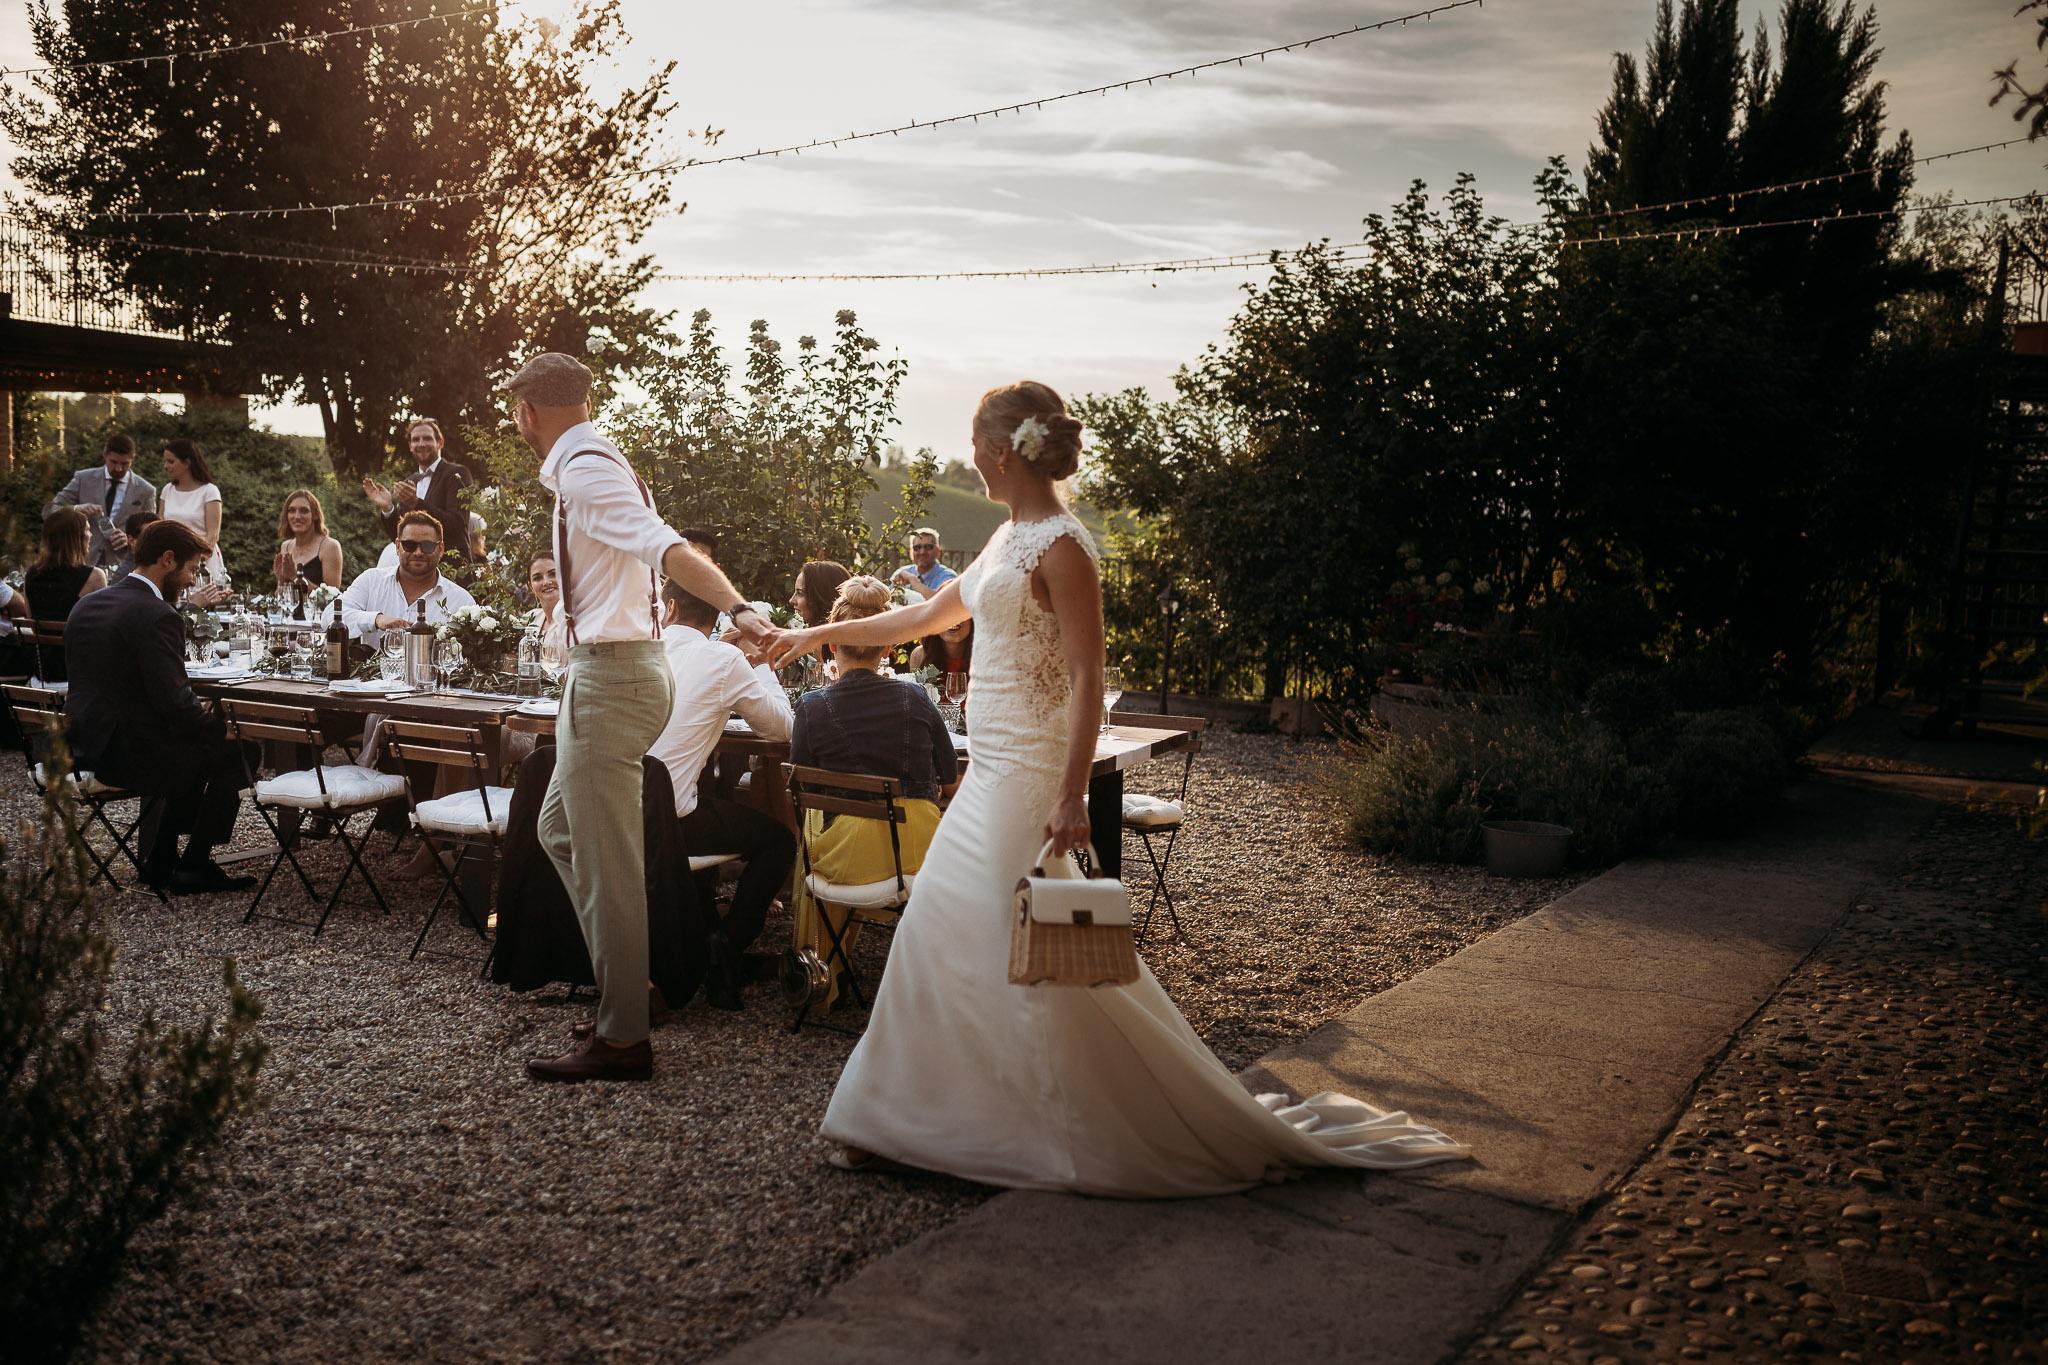 Wedding party at La Villa Hotel, Mombaruzzo